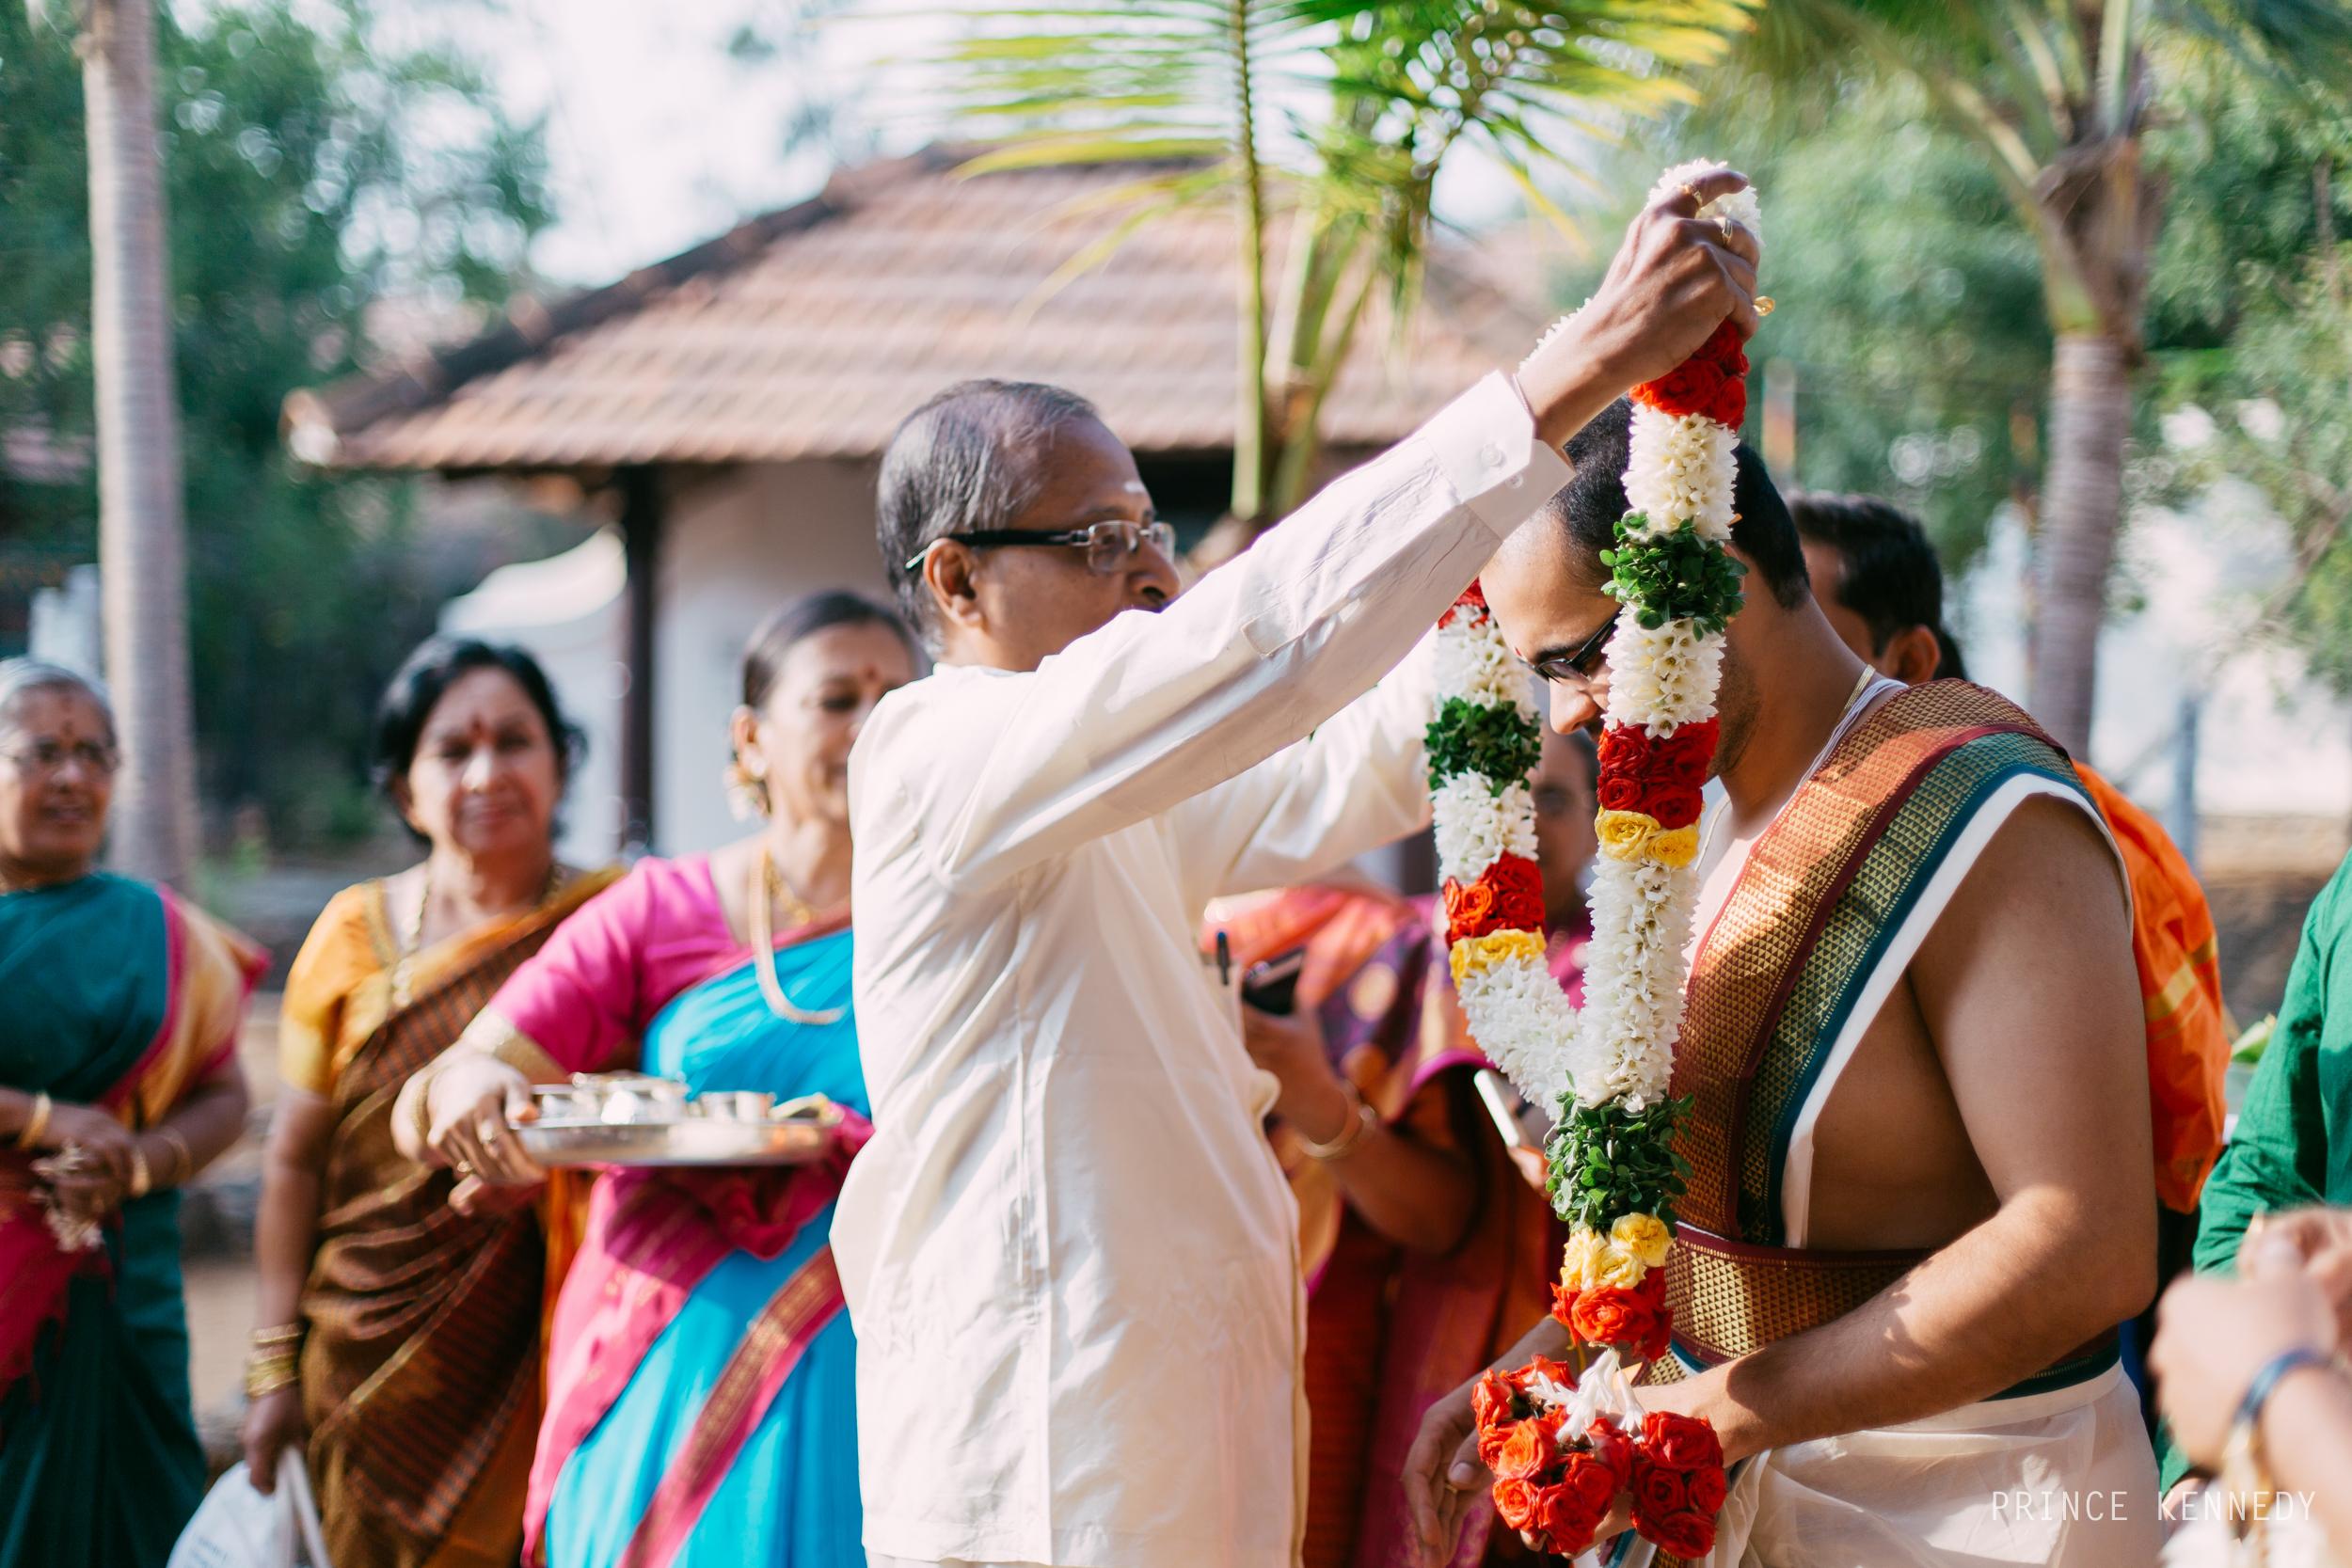 Athmajja-Nithesh-Engagement-Couple-Portrait-Portraiture-Wedding-Couple-Portrait-Chennai-Photographer-Candid-Photography-Destination-Best-Prince-Kennedy-Photography-32.jpg